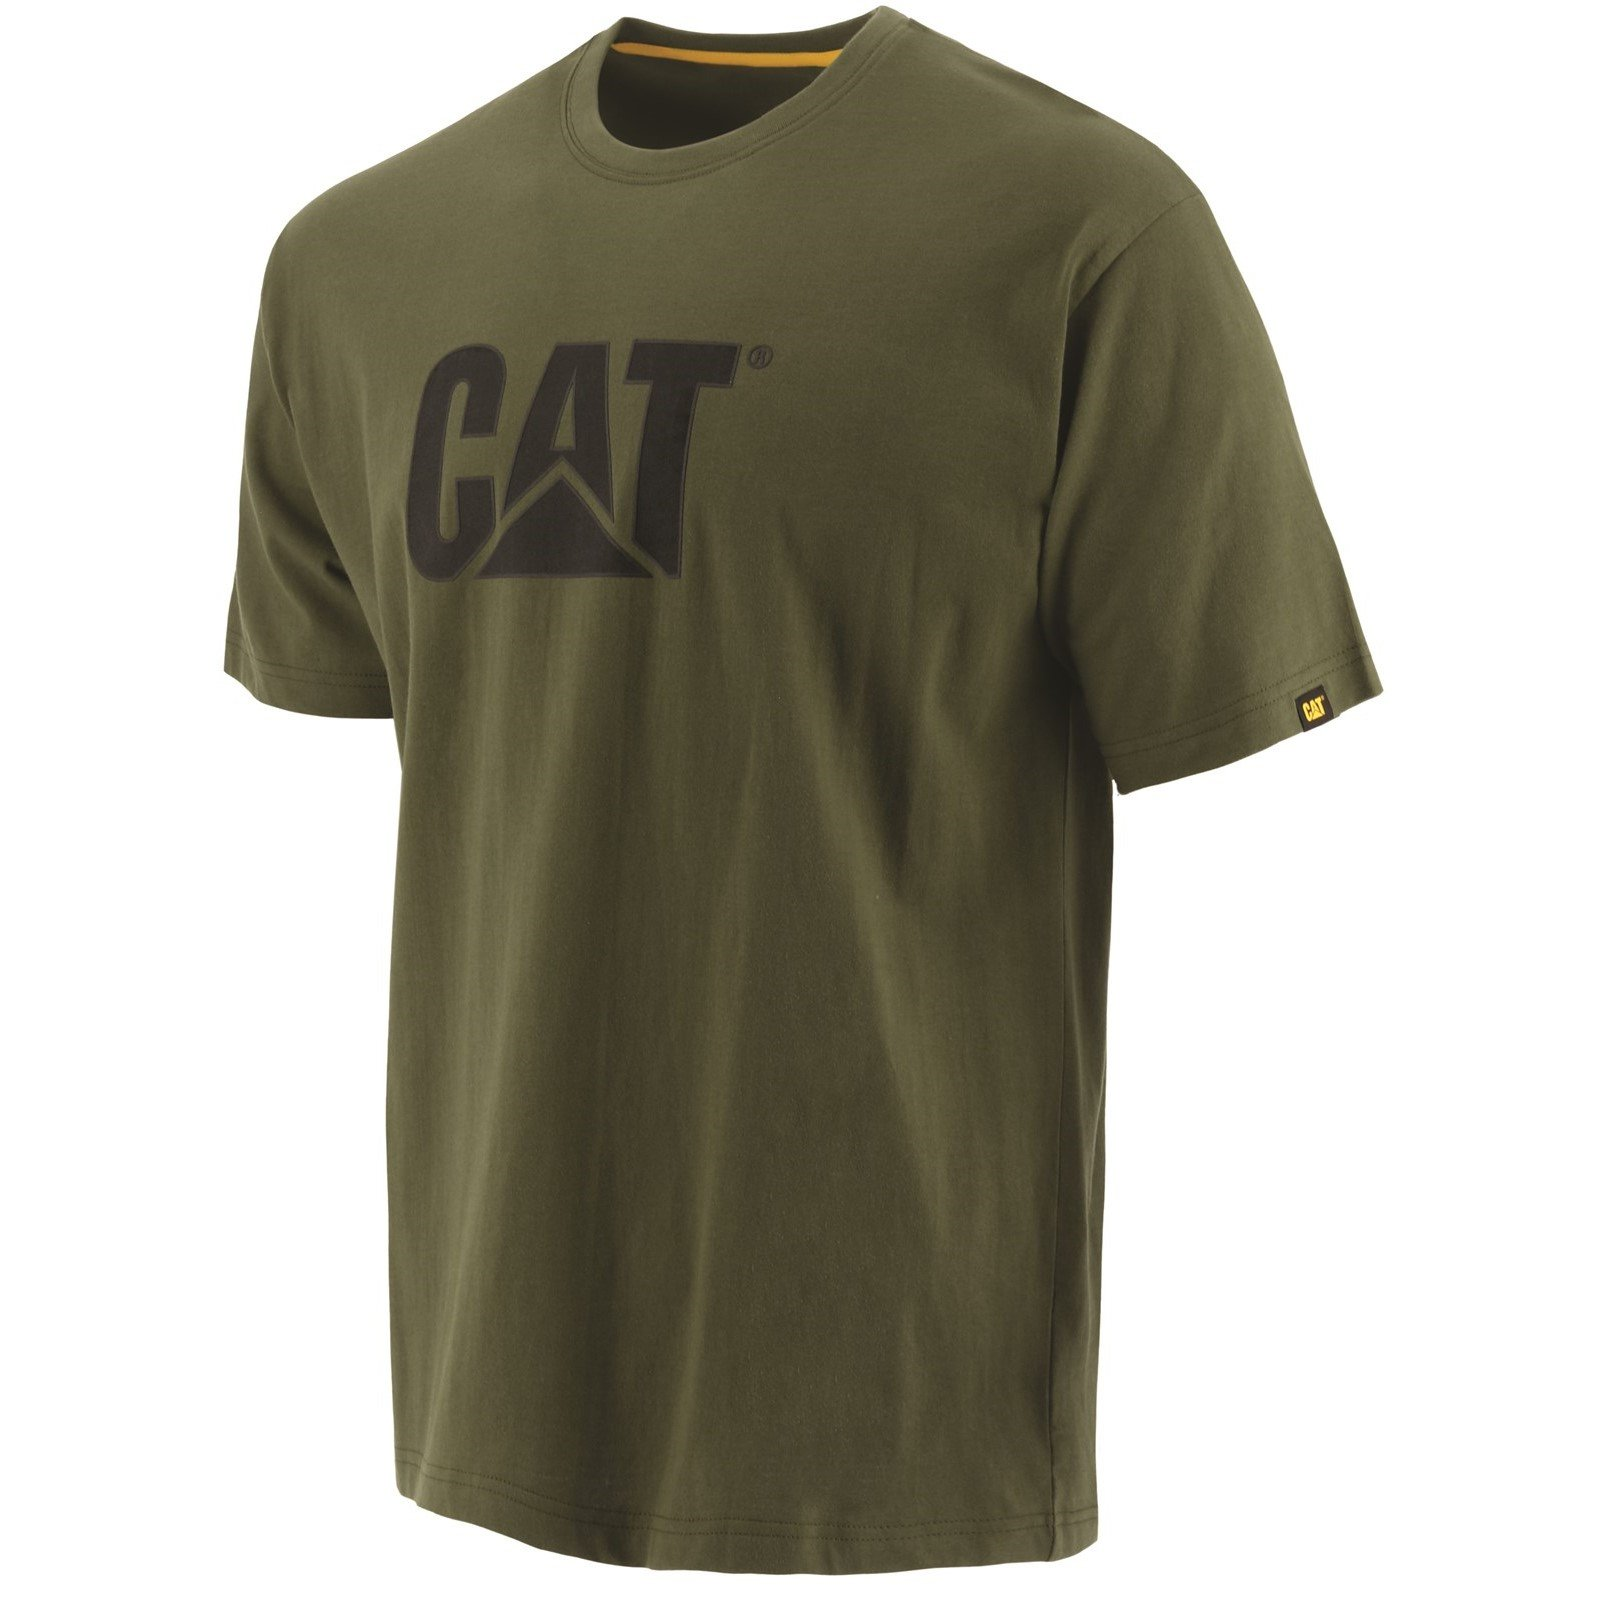 Caterpillar Men's Trademark Logo T-Shirt Various Colours 25301-42086 - Chive Med